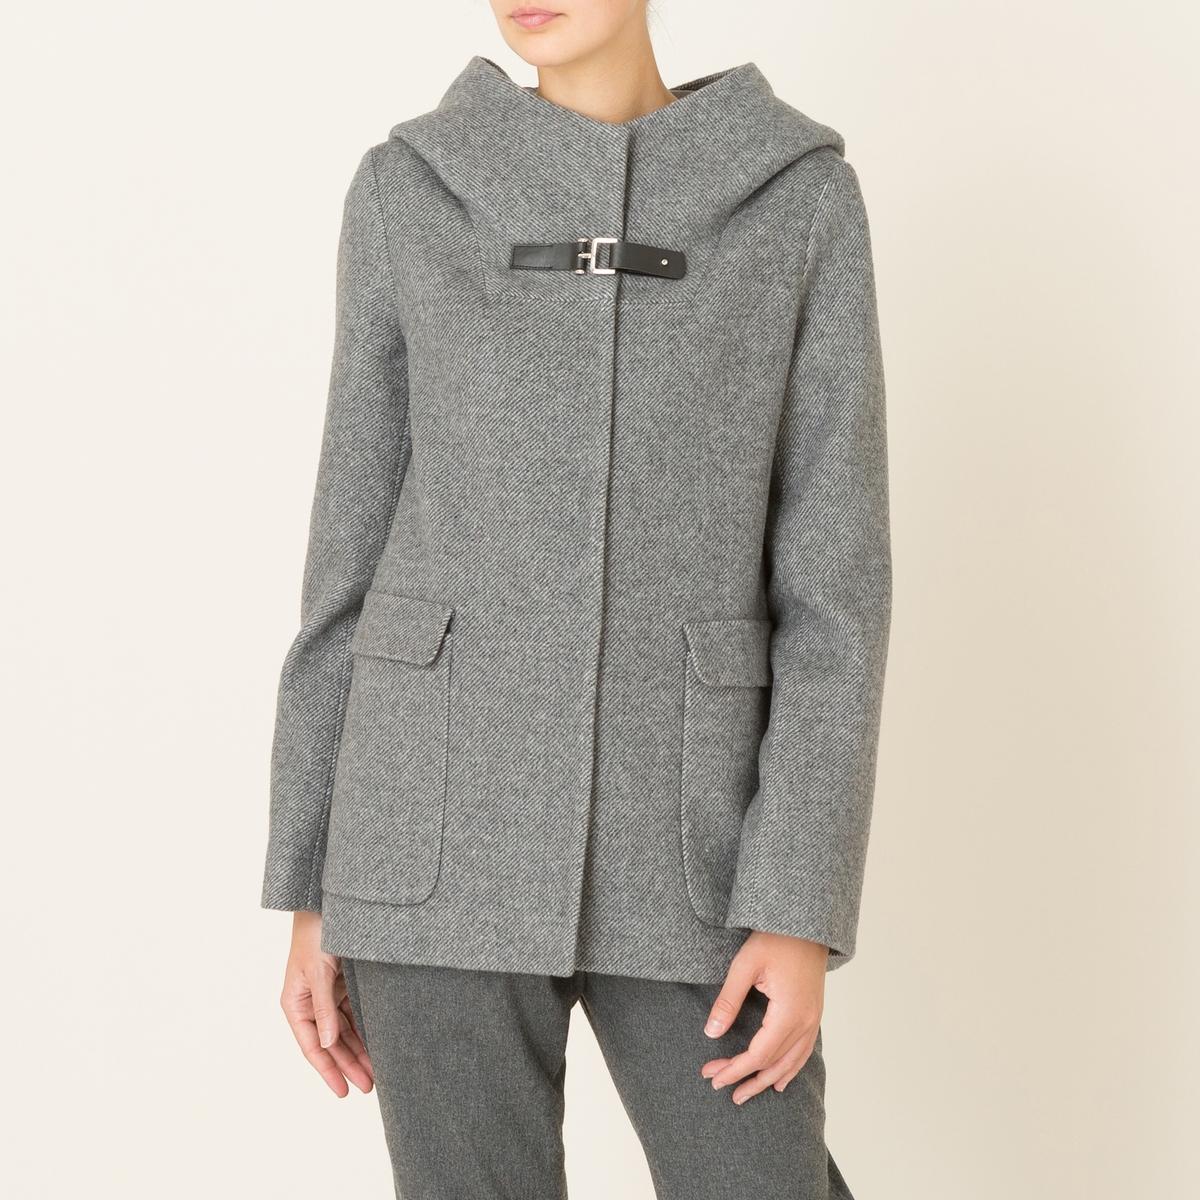 Пальто короткое из шерстяного драпа пальто из шерстяного драпа 70